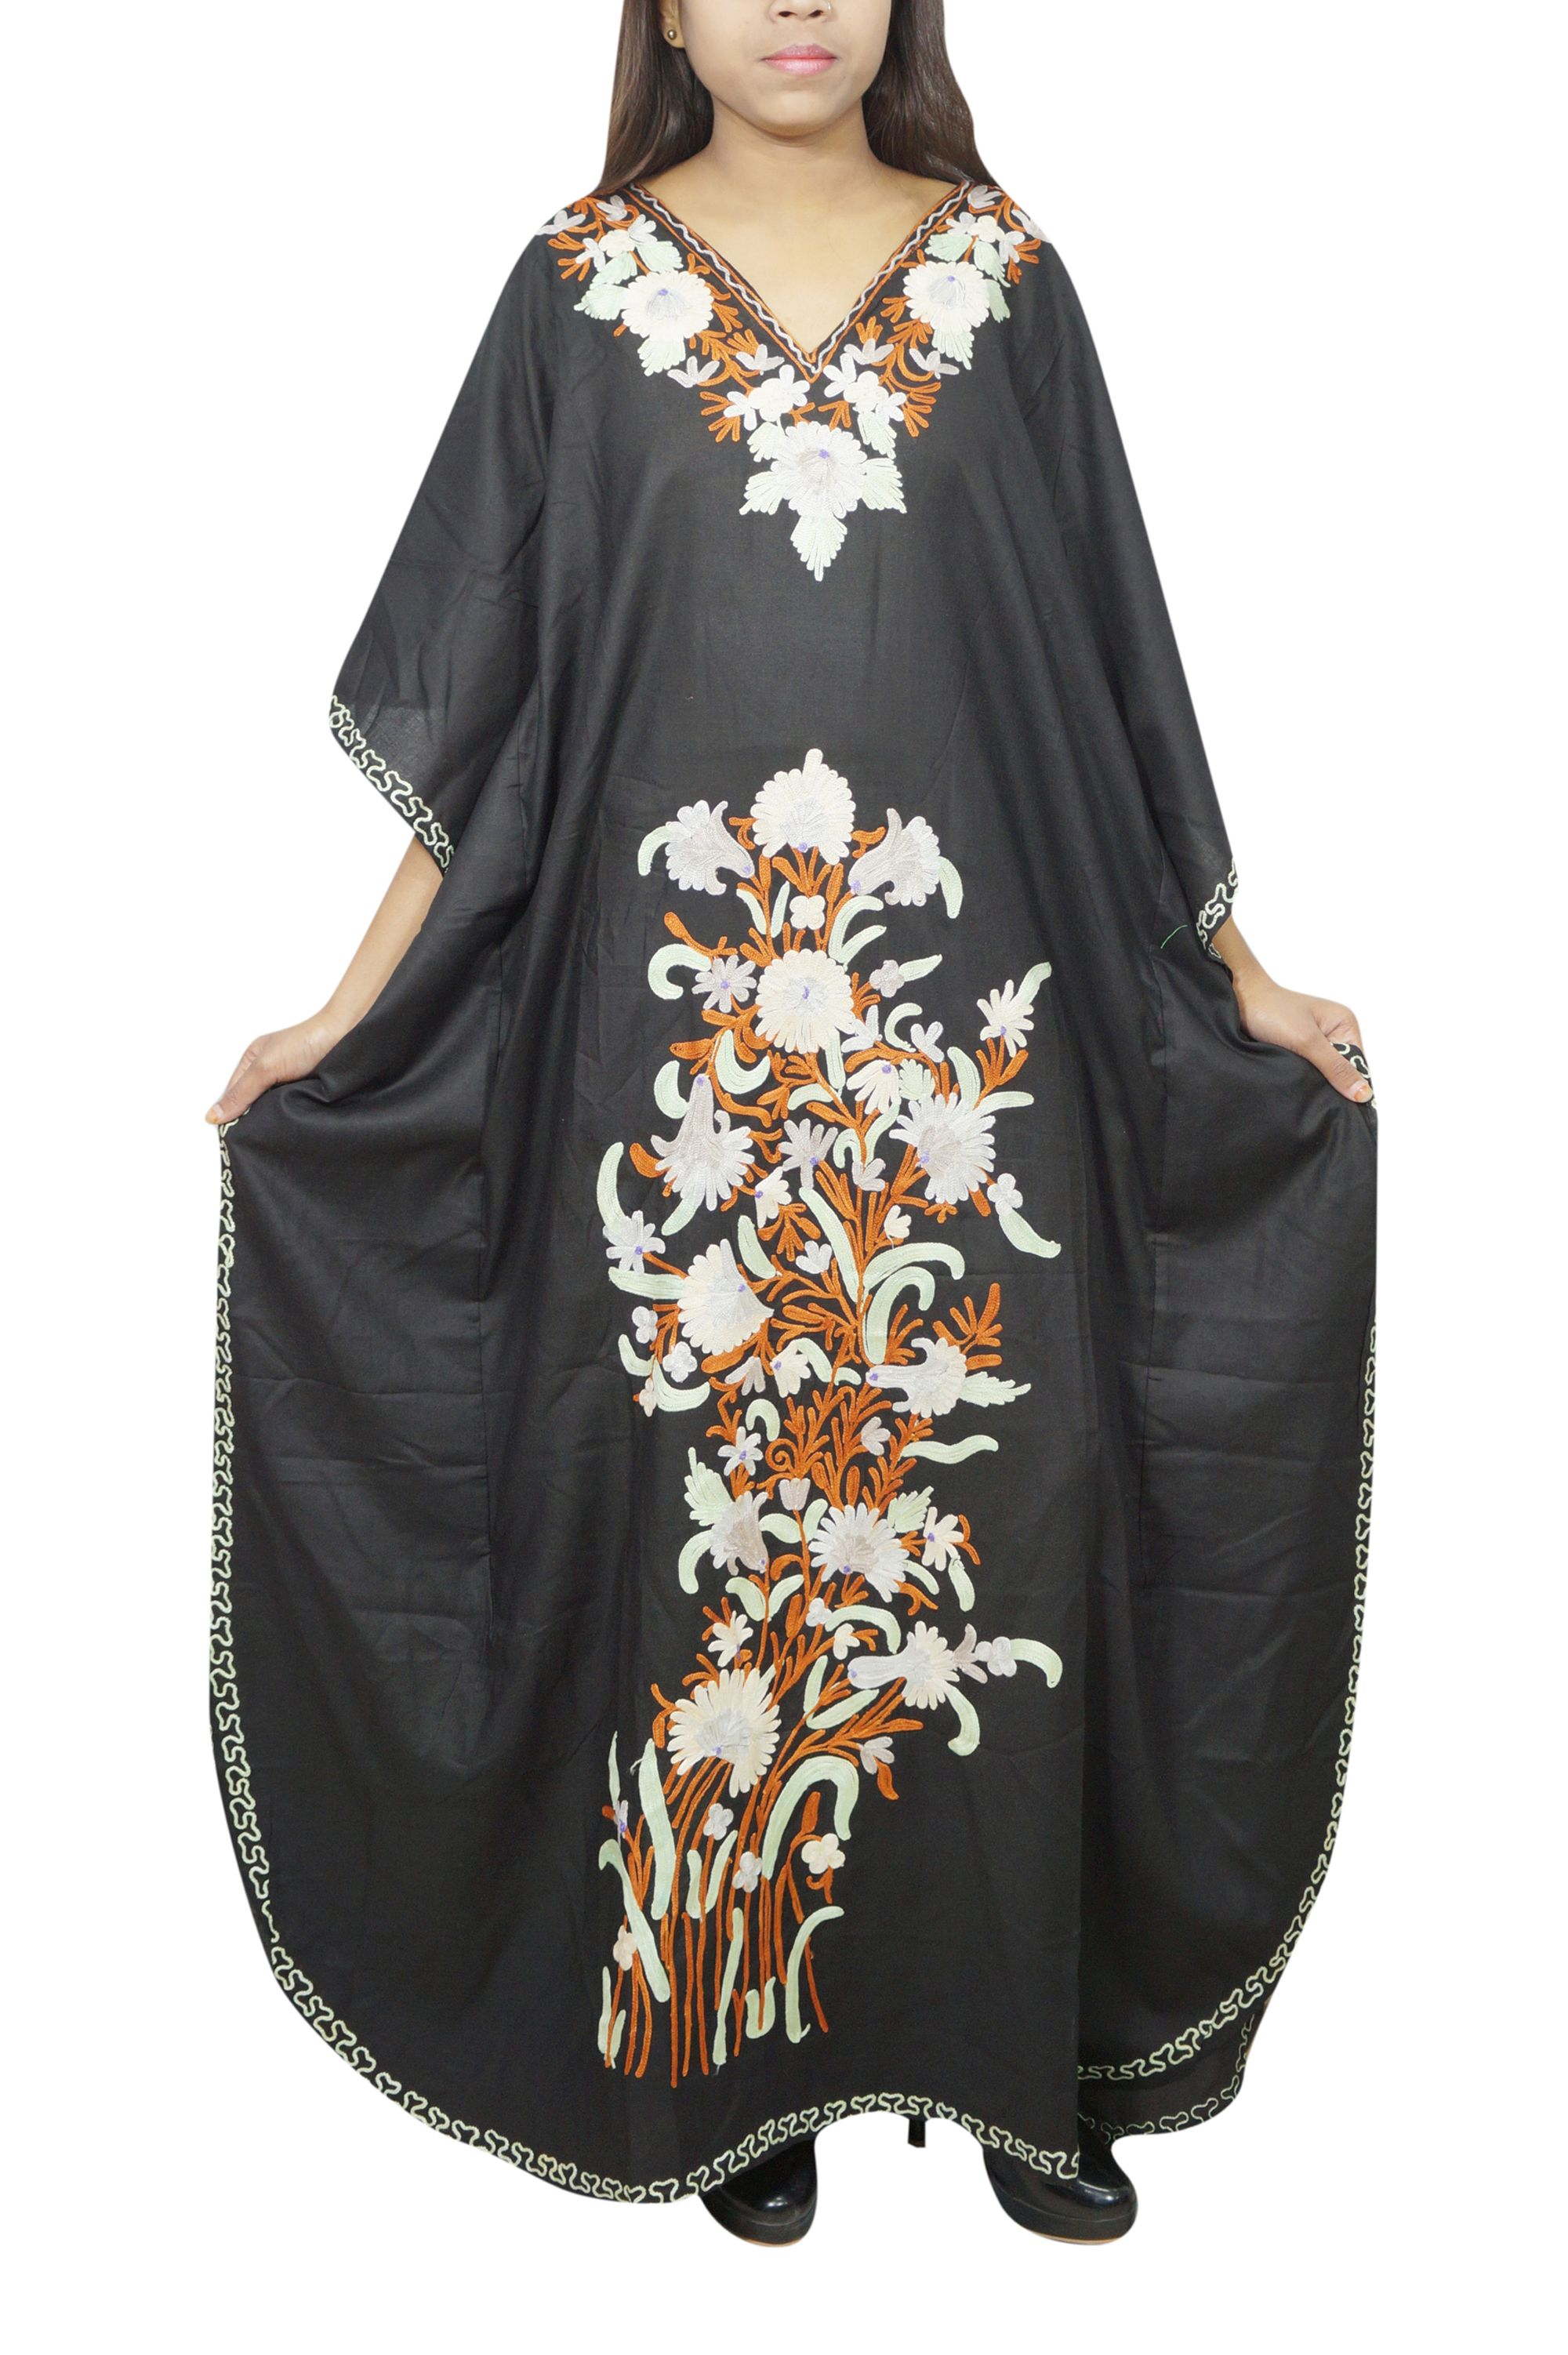 Mogul Interior Mogul Women S Cotton Blend Maxi Caftan Black Floral Embroidered V Neck Kimono Sleeves House Colorful Maxi Dress Caftan Dress Long Kaftan Dress [ 3004 x 2000 Pixel ]